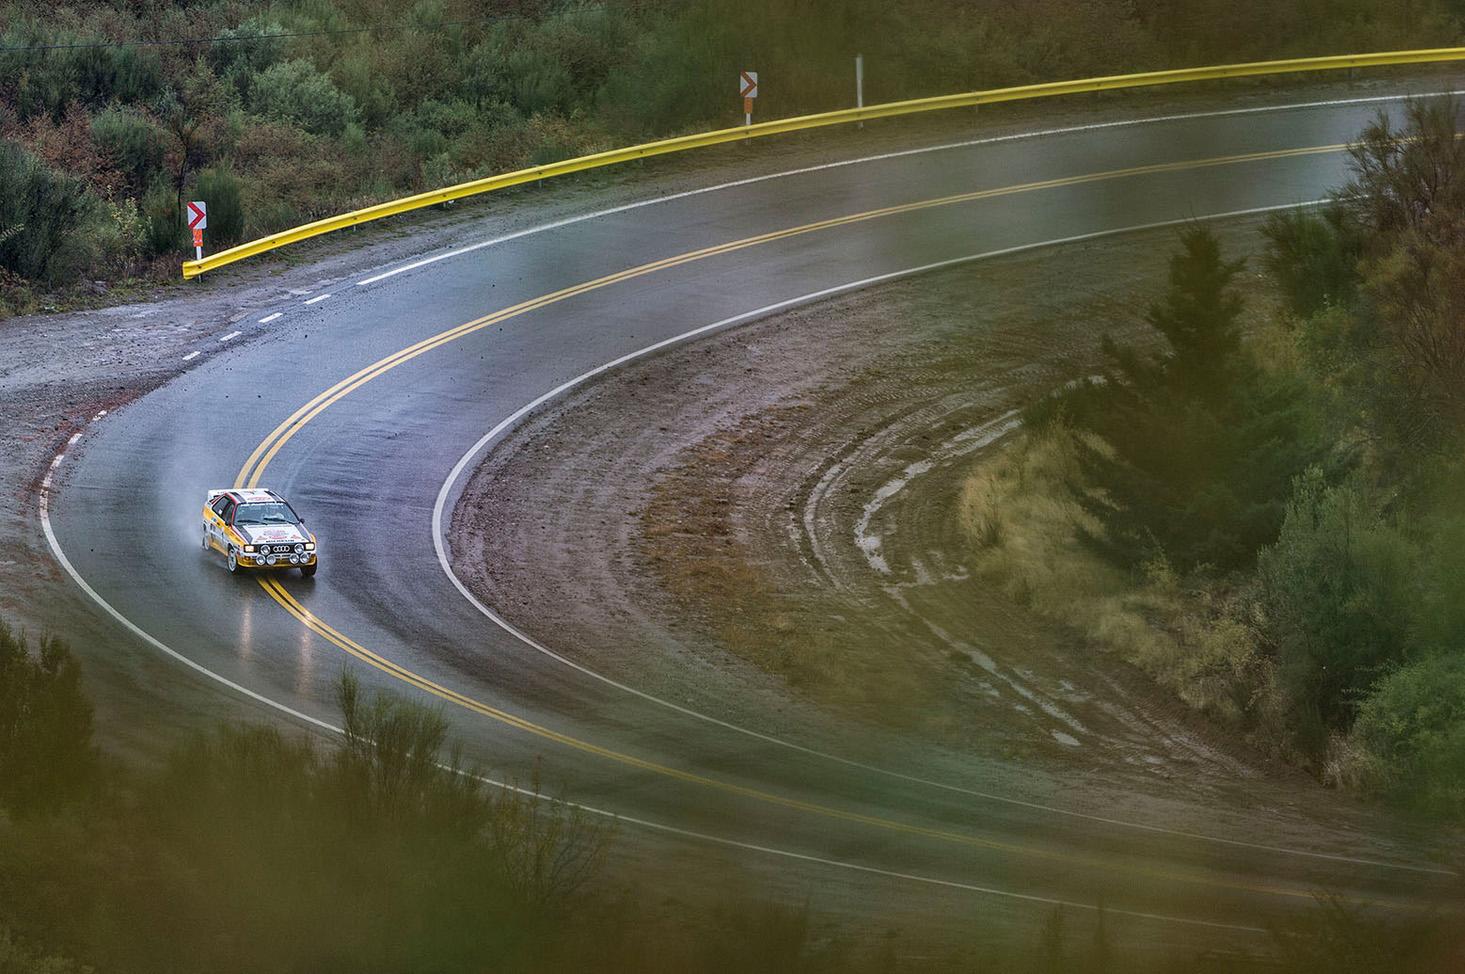 607_Audi_Rallyquattro_Arg_102.jpg